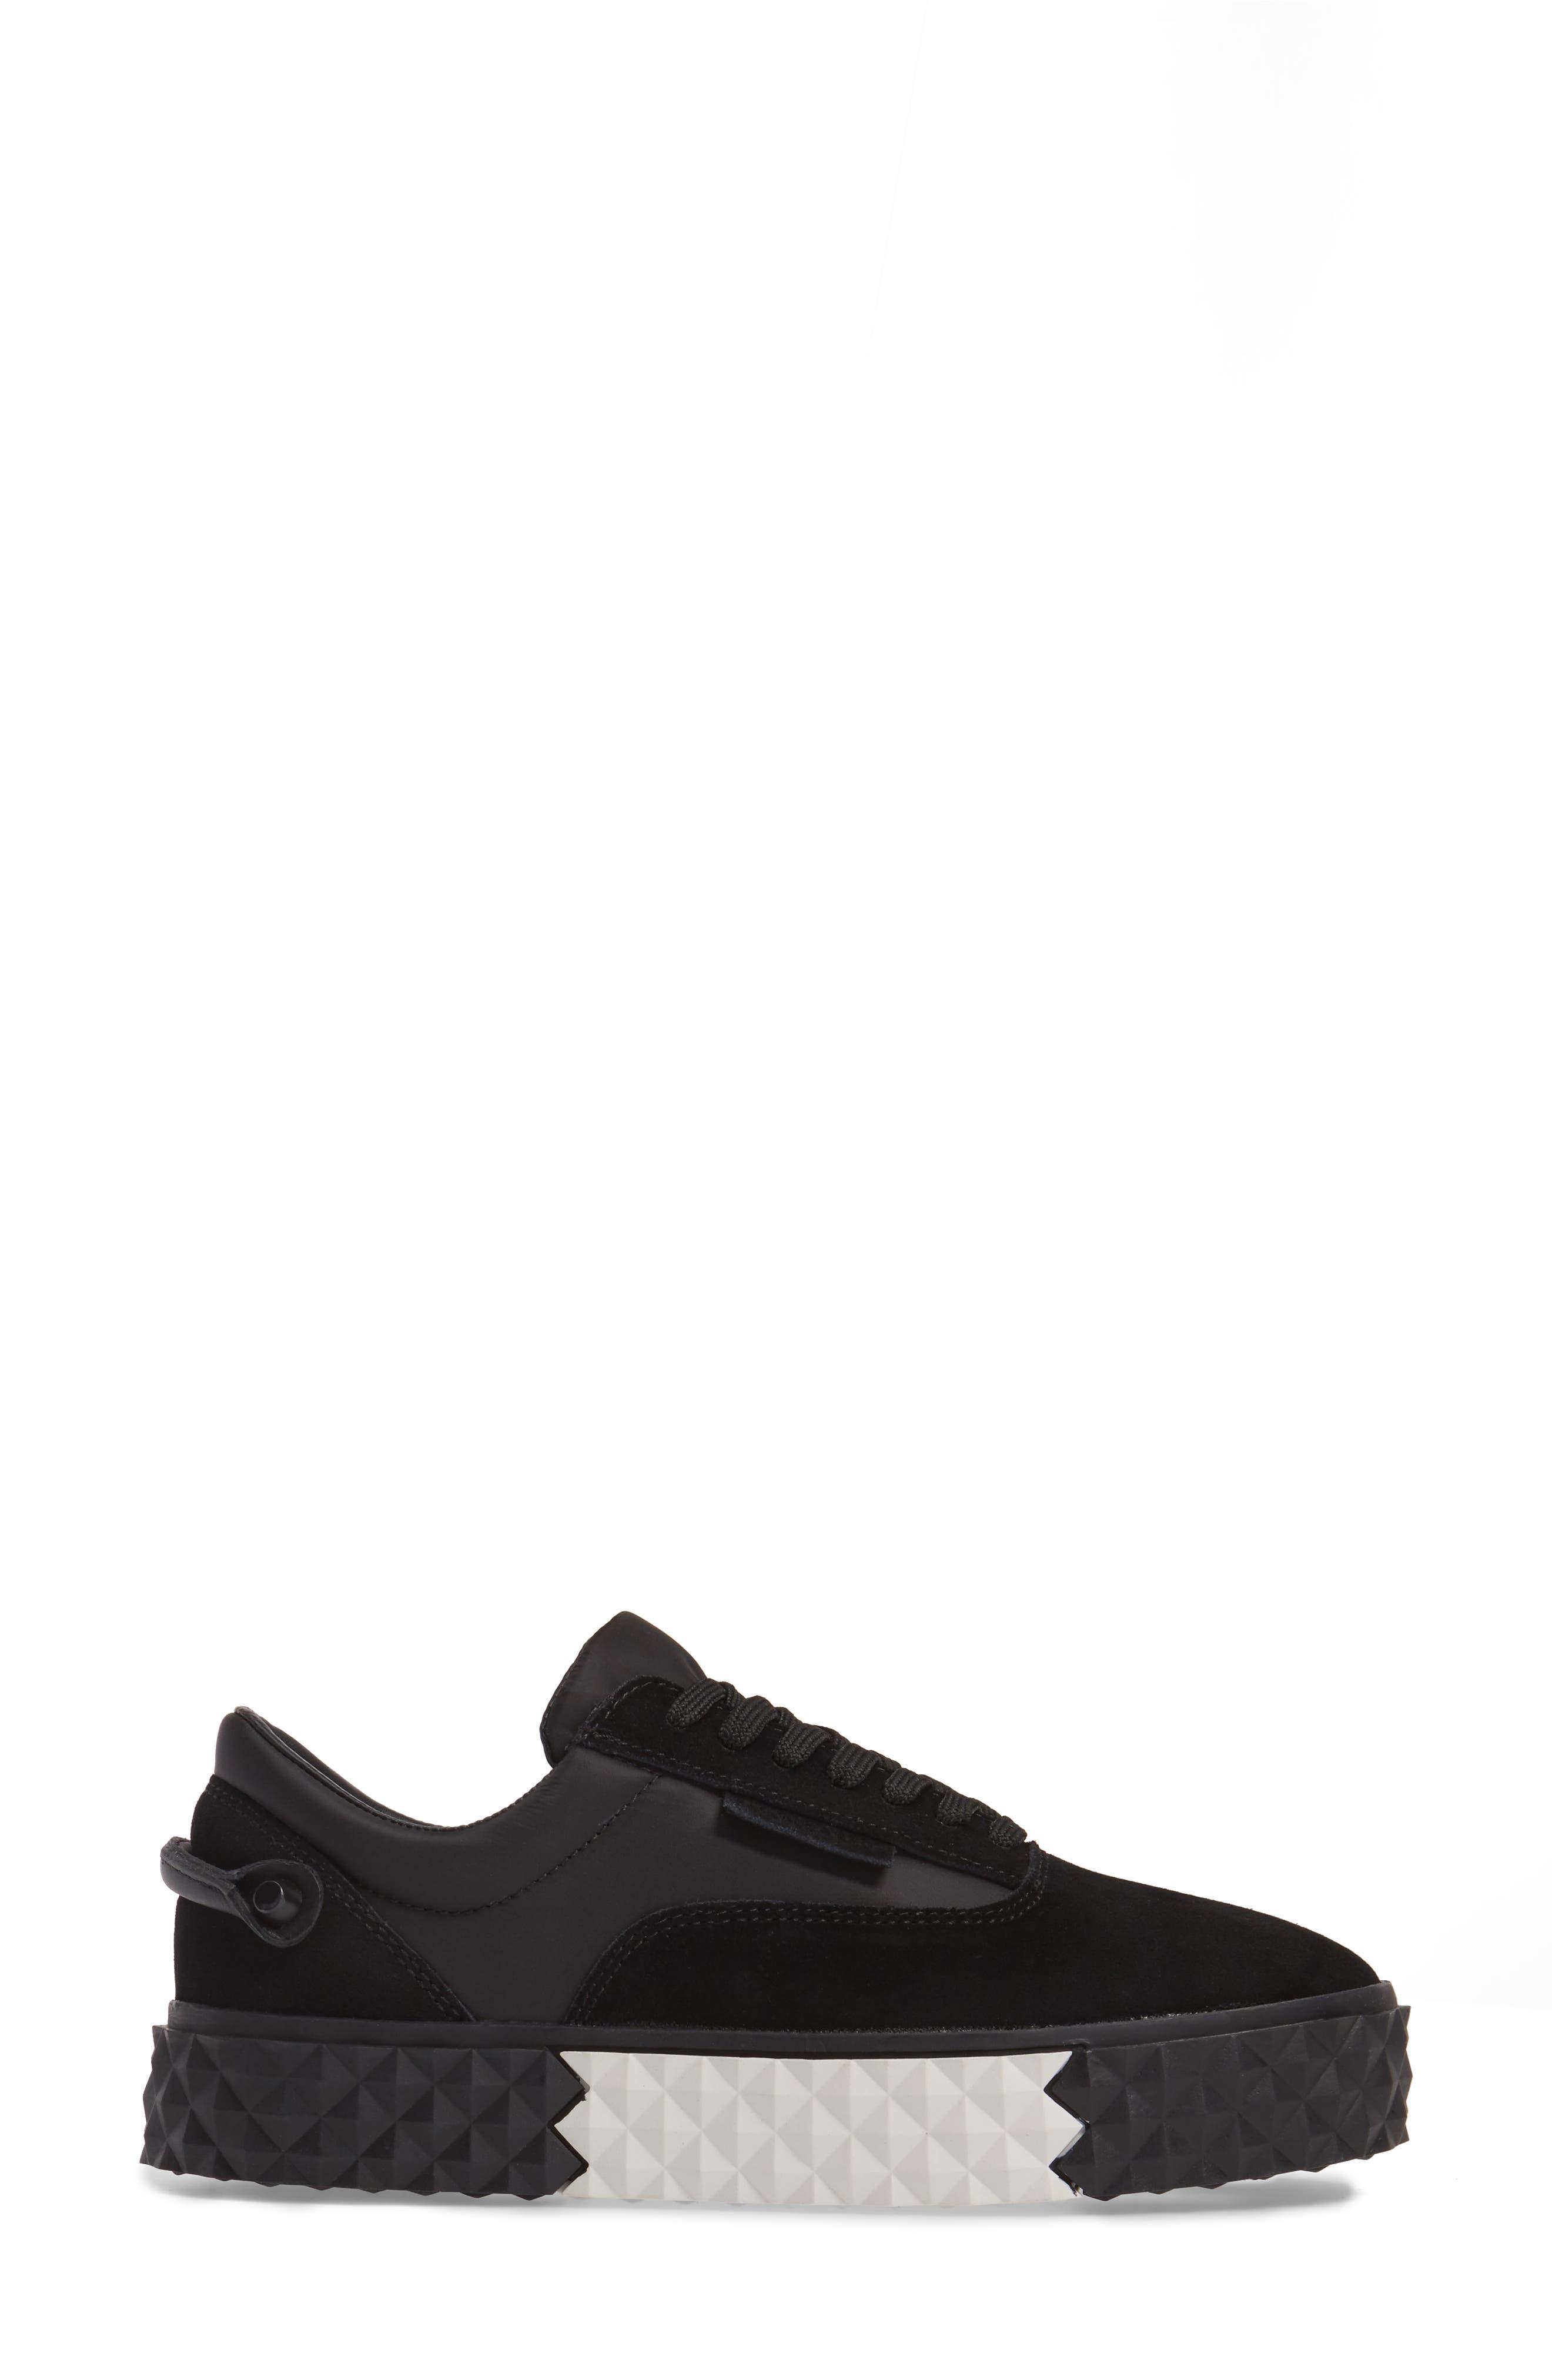 Reign Platform Sneaker,                             Alternate thumbnail 3, color,                             005